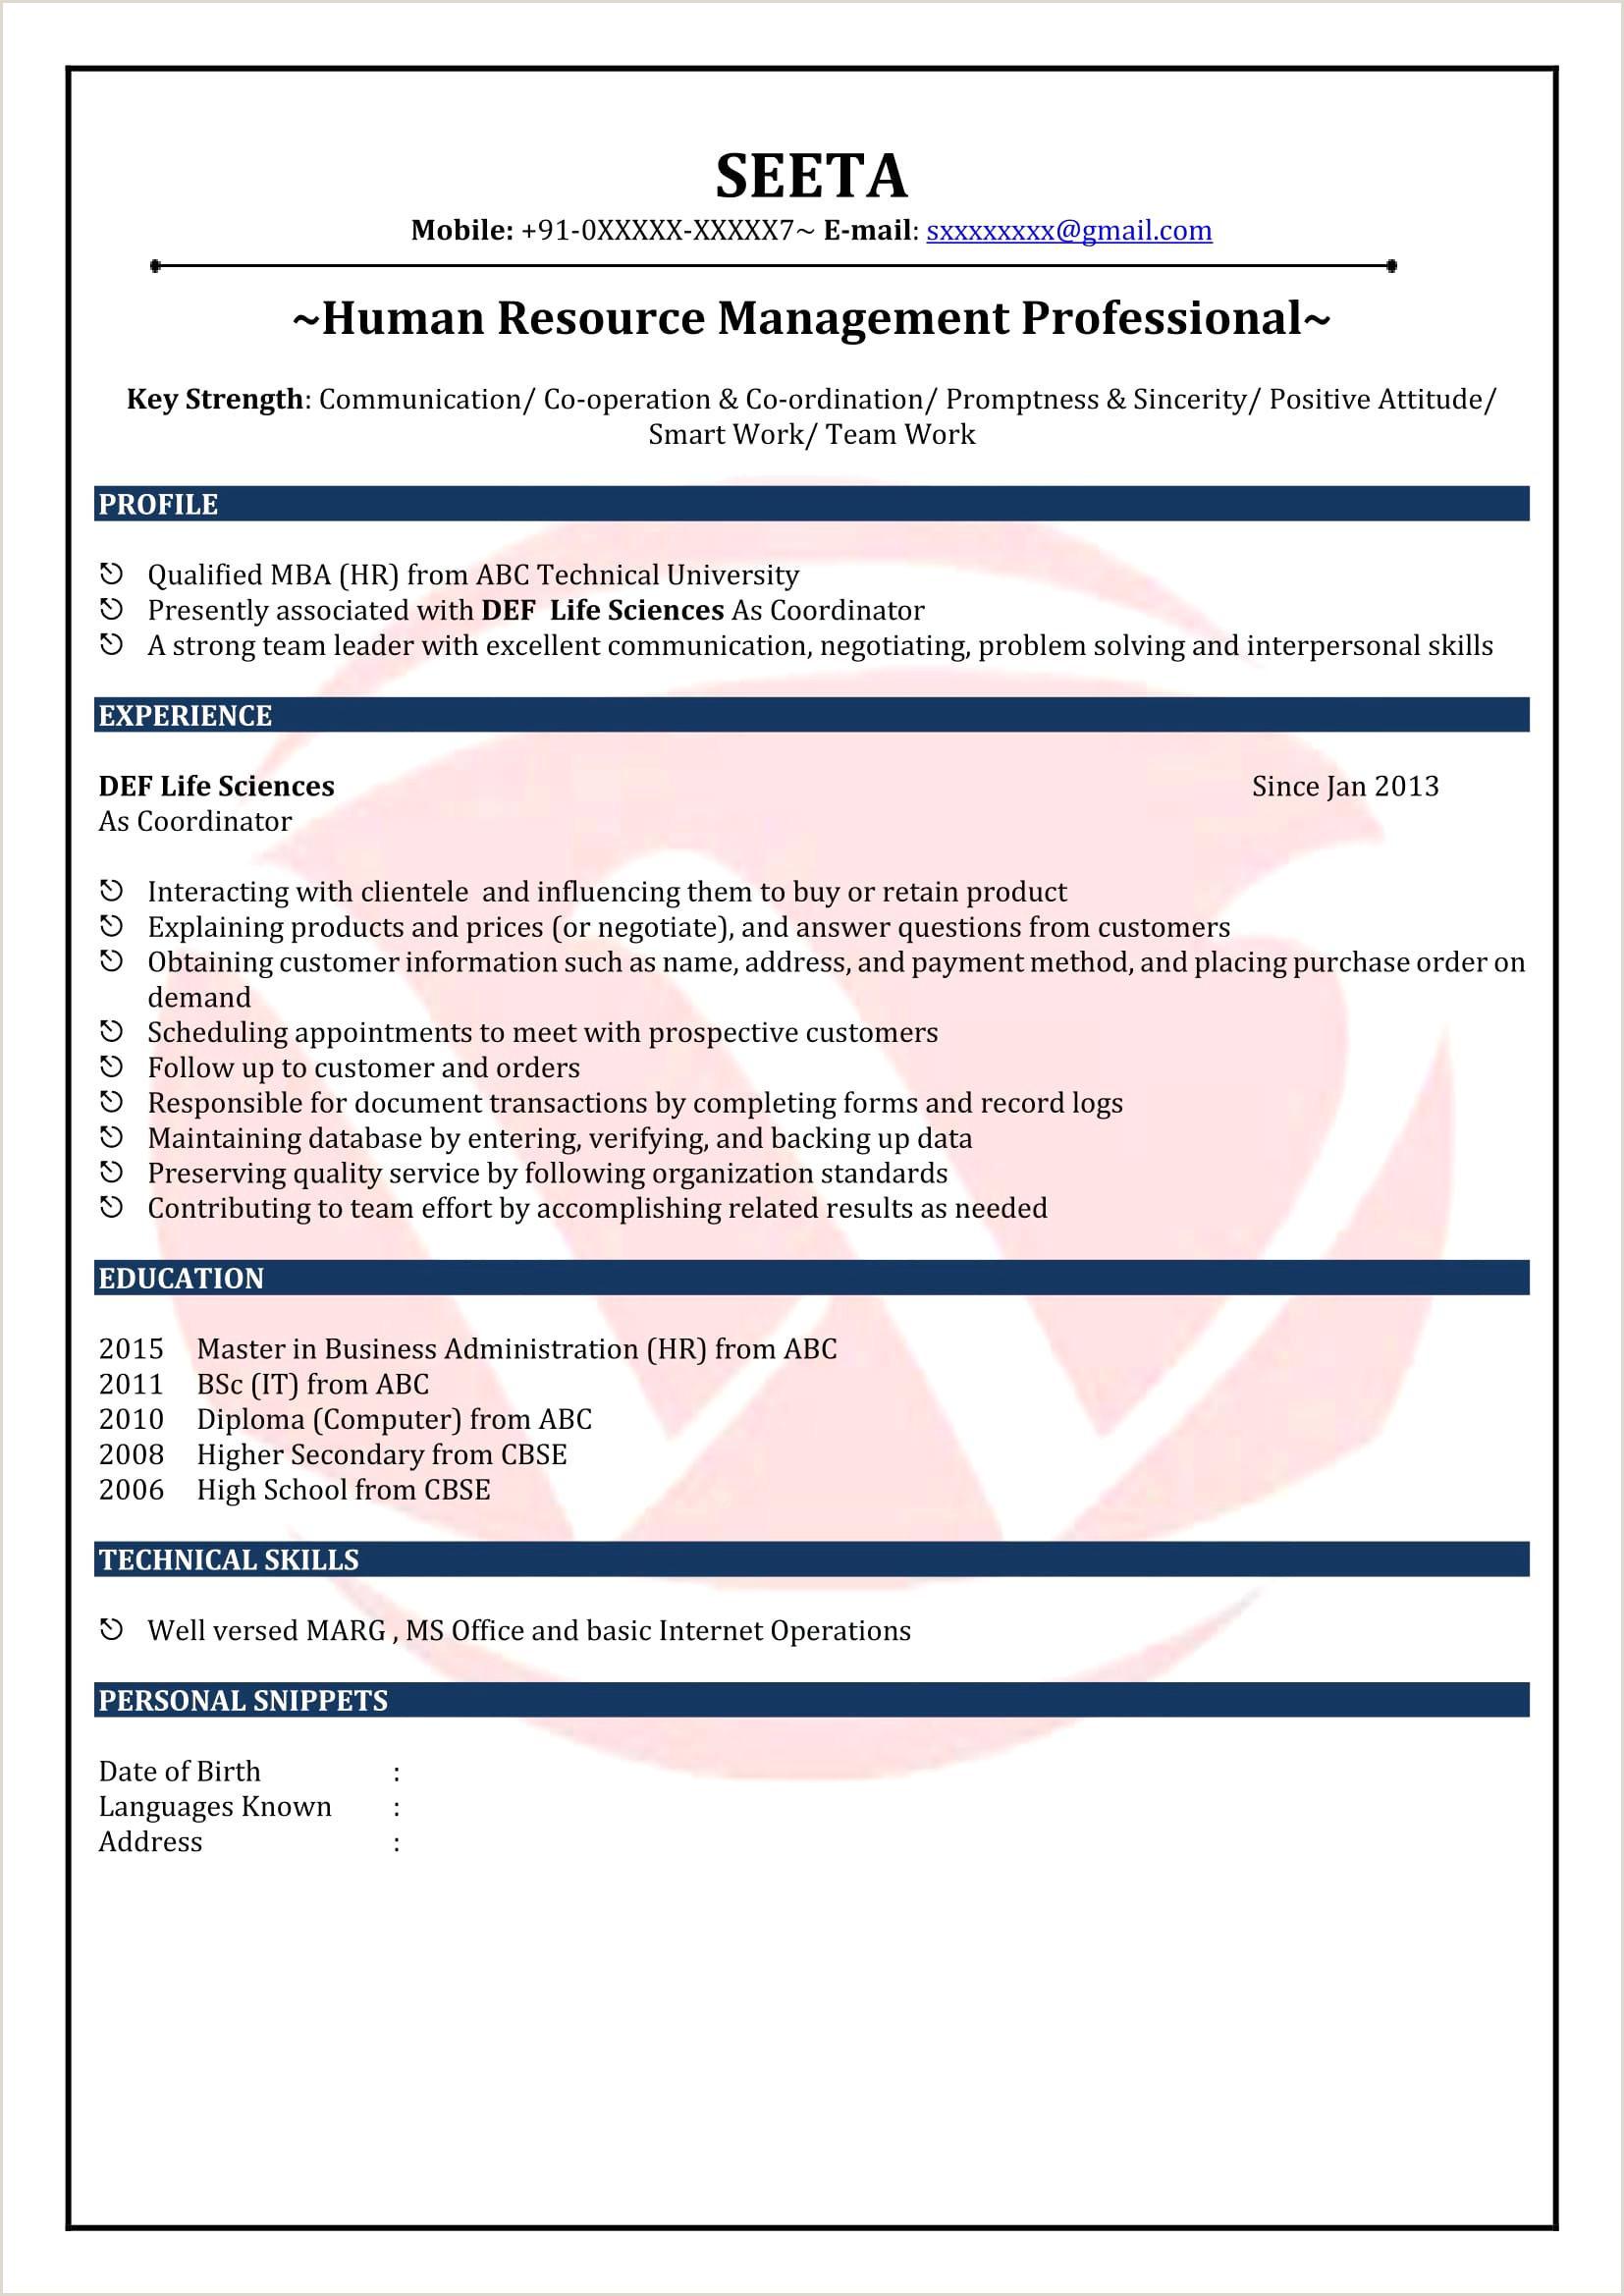 Fresher Cv format Beautiful Mba Fresher Resume format Pdf